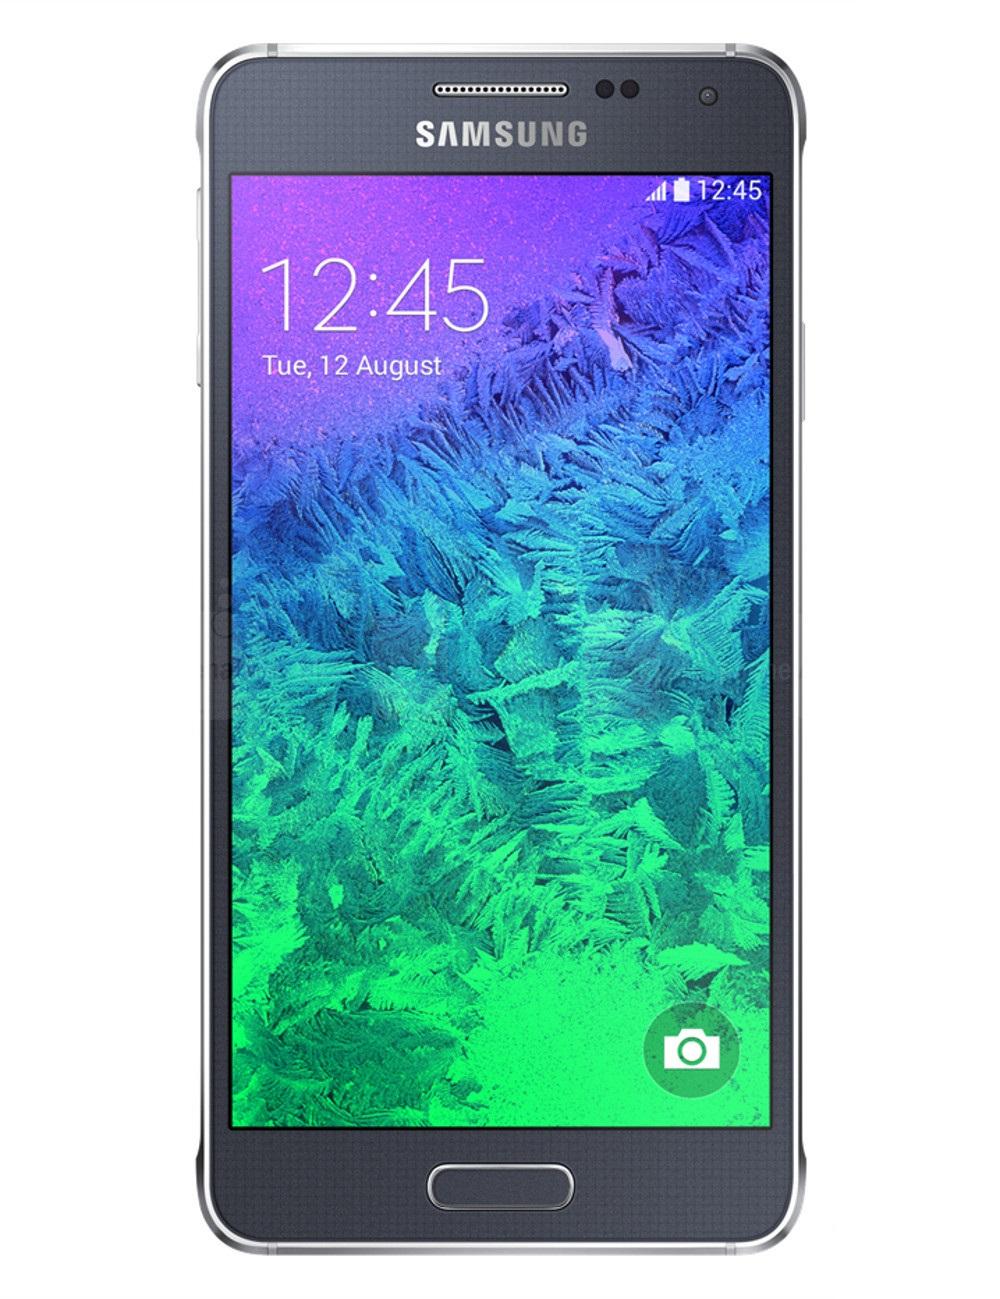 Top 5 Best Samsung Phones Ever Made - UnlockUnit Blog